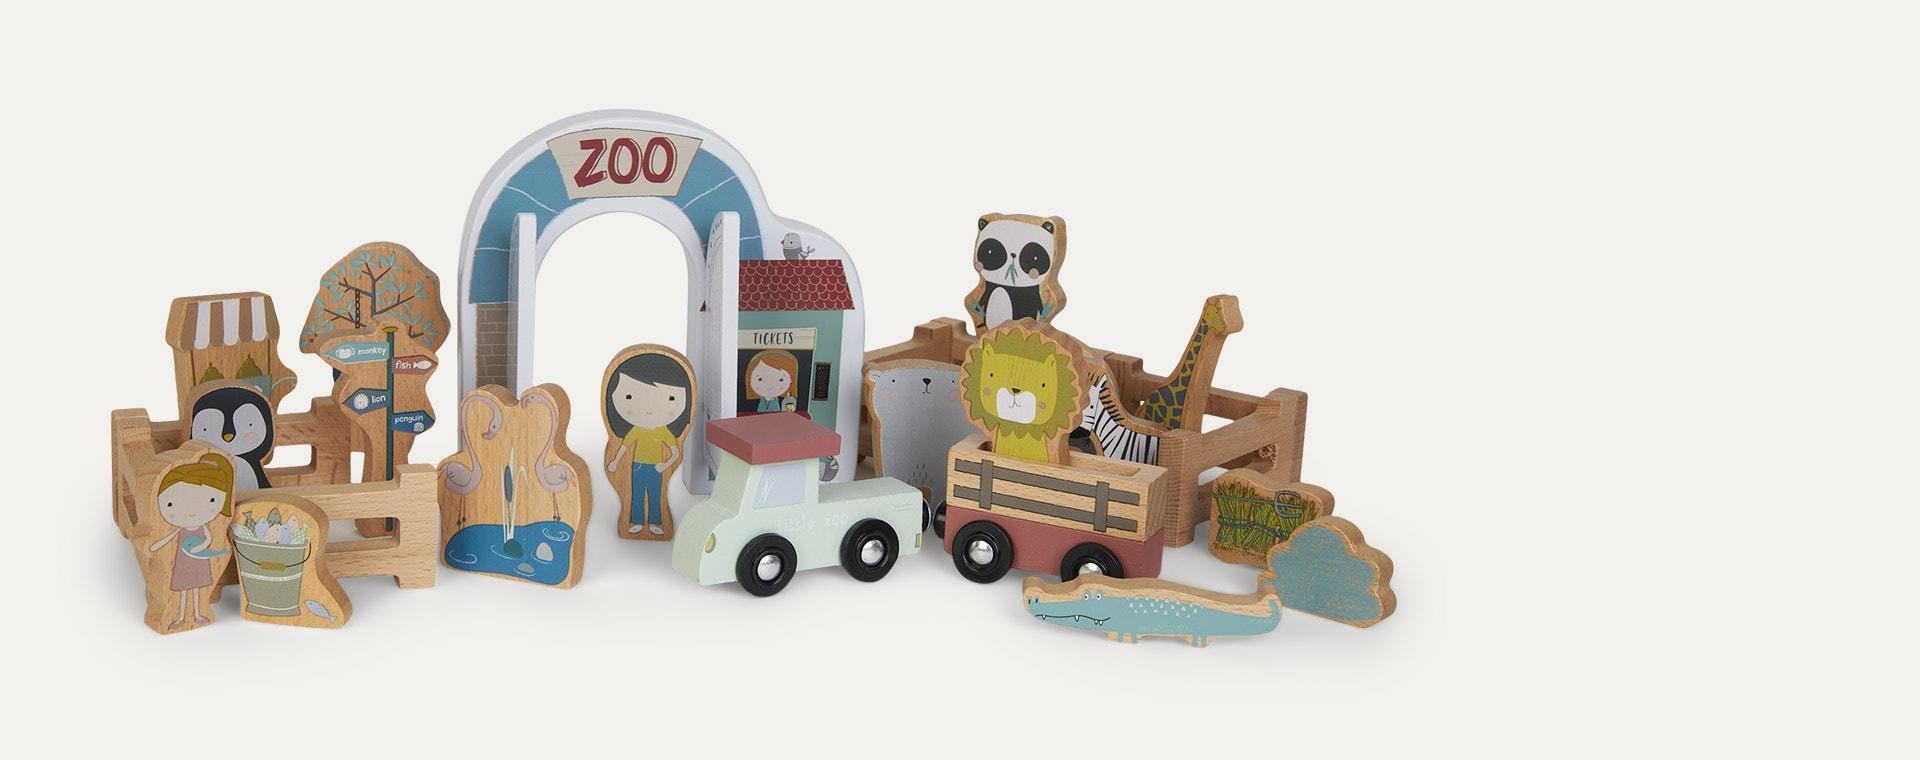 Multi Little Dutch Railway Train Extension - Zoo